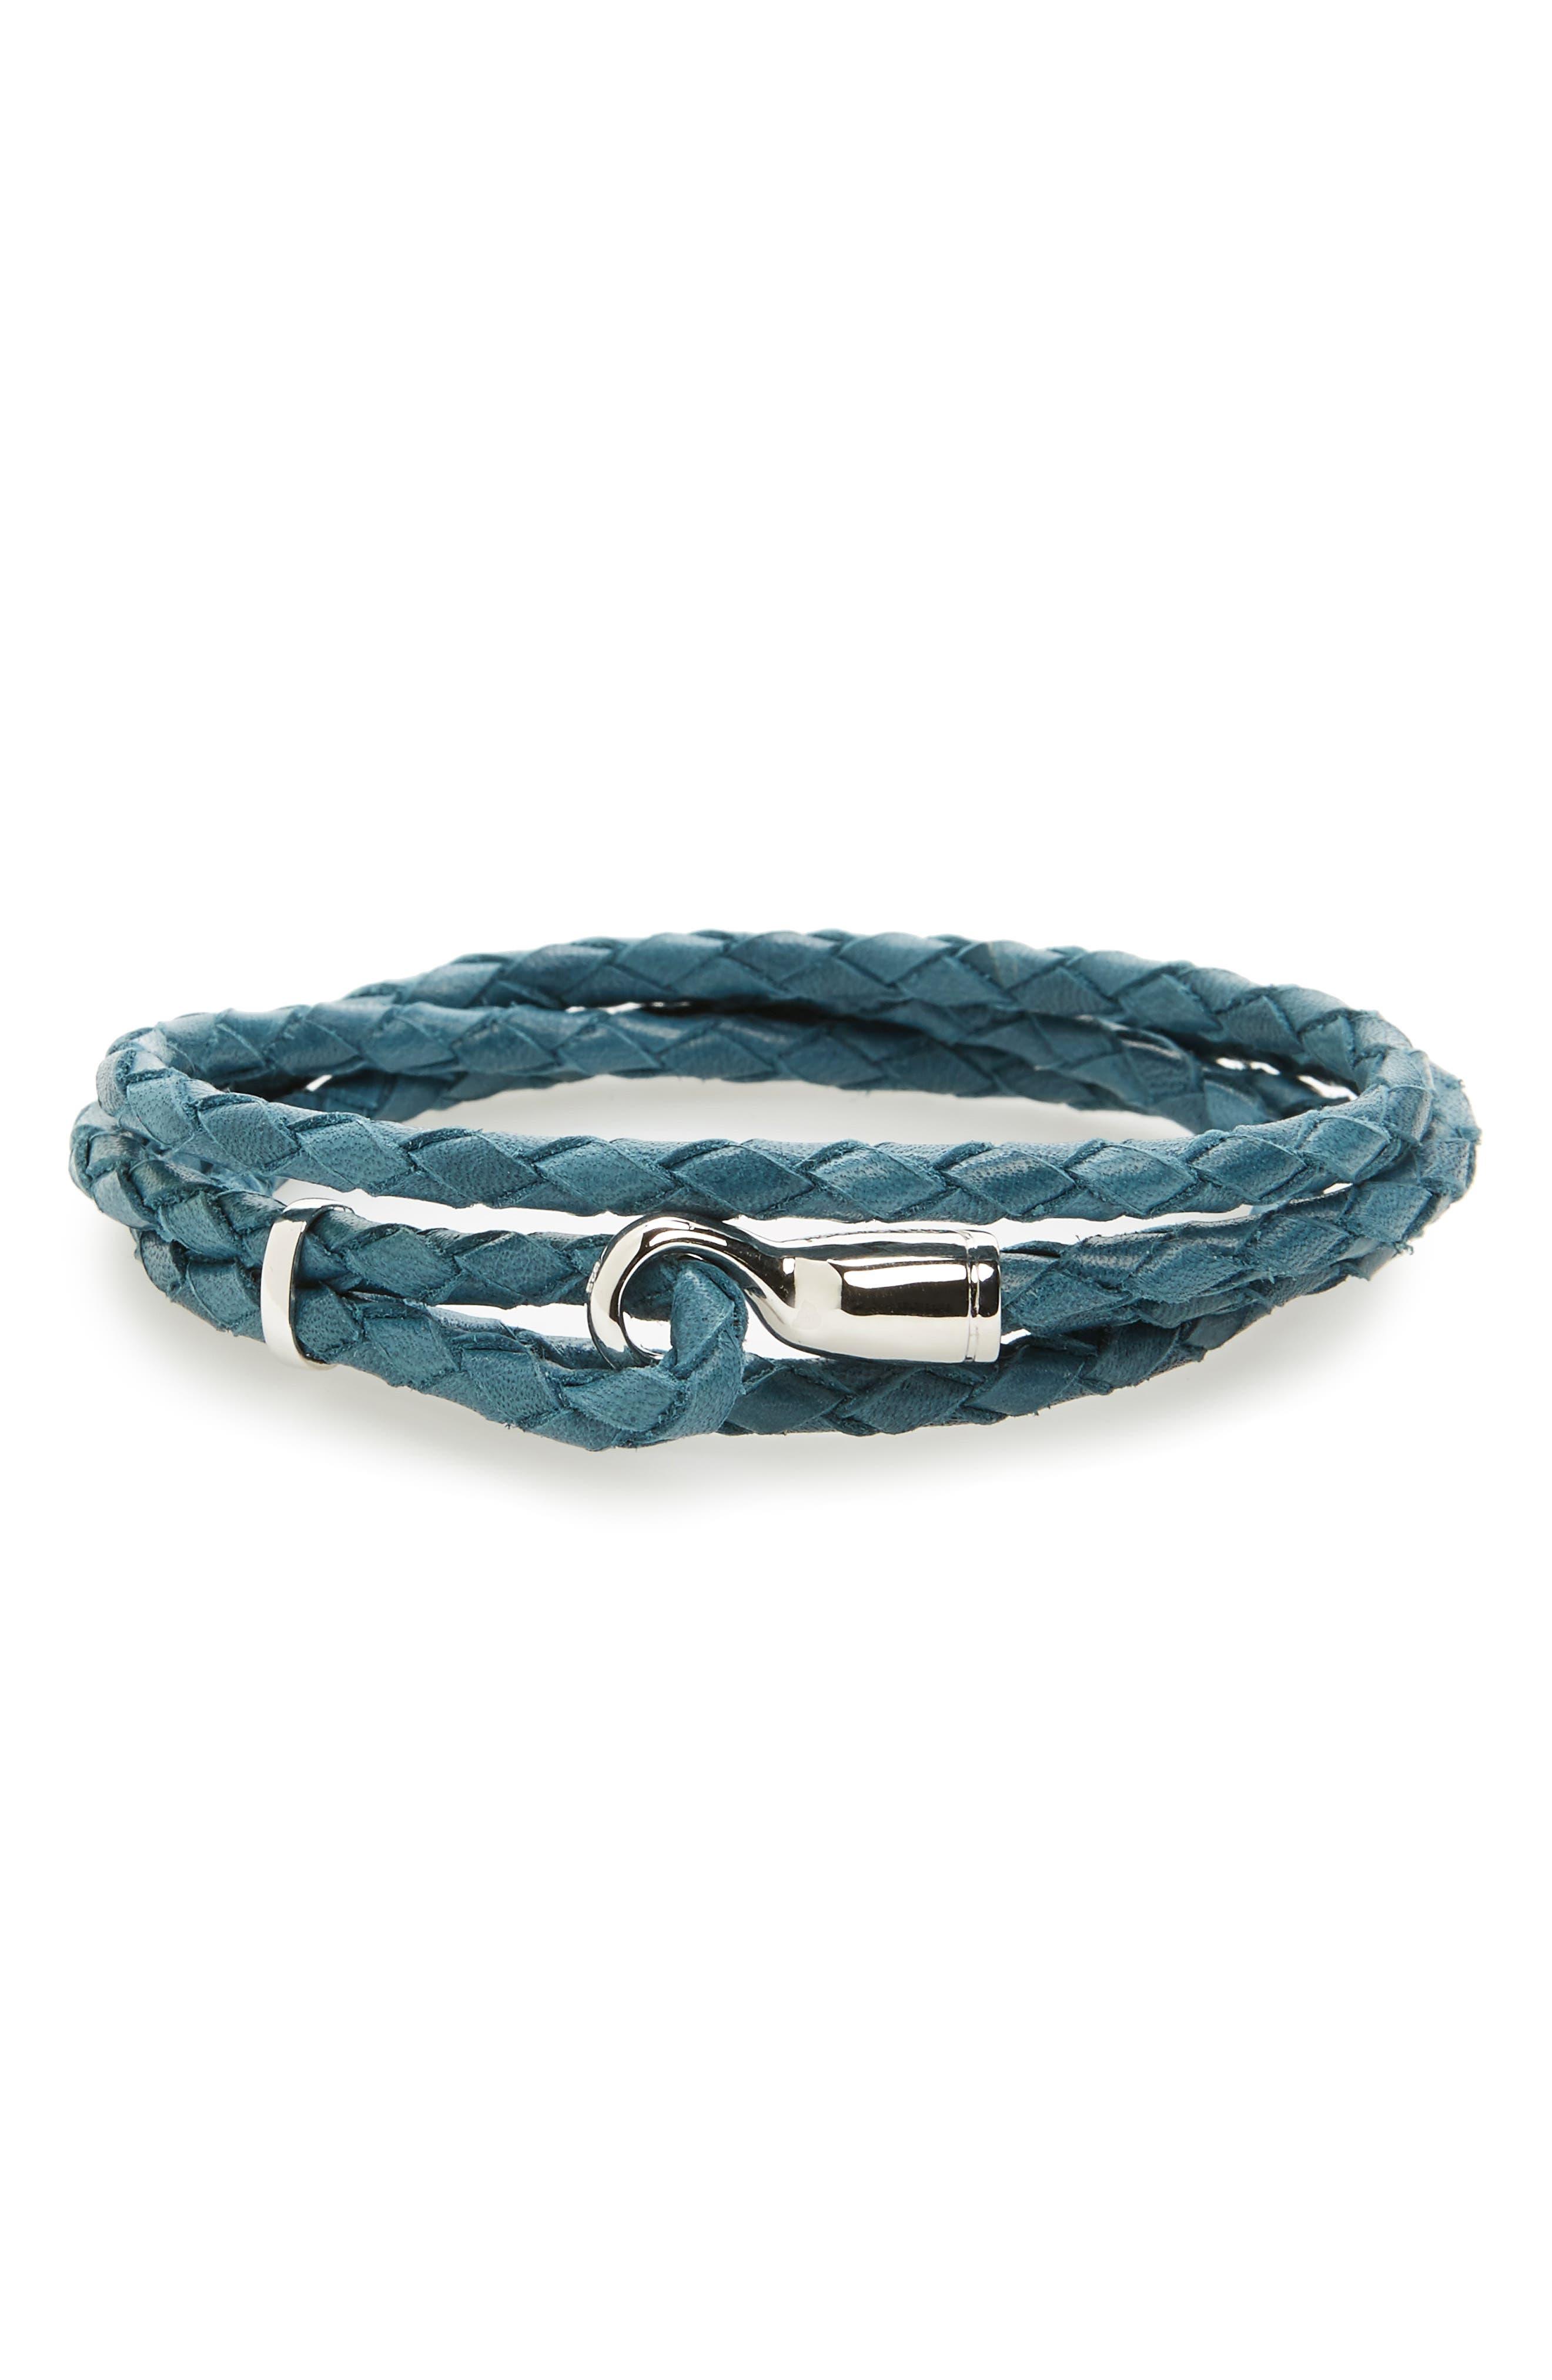 Main Image - Miansai Braided Leather Bracelet